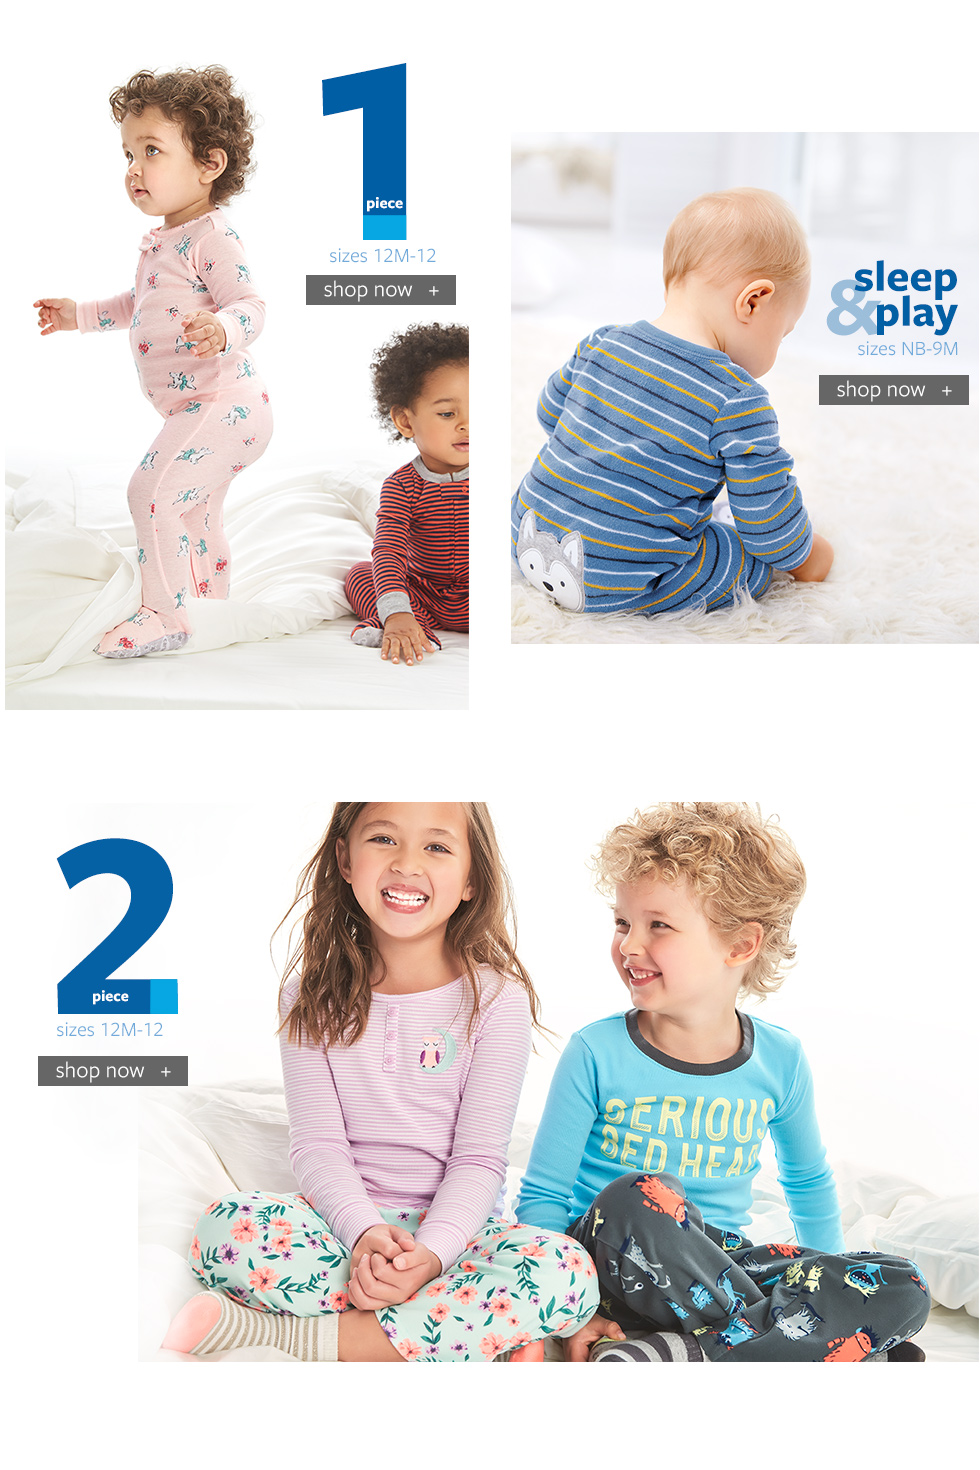 PJ Shop - 1 Piece, 2 Piece, Sleep and Play